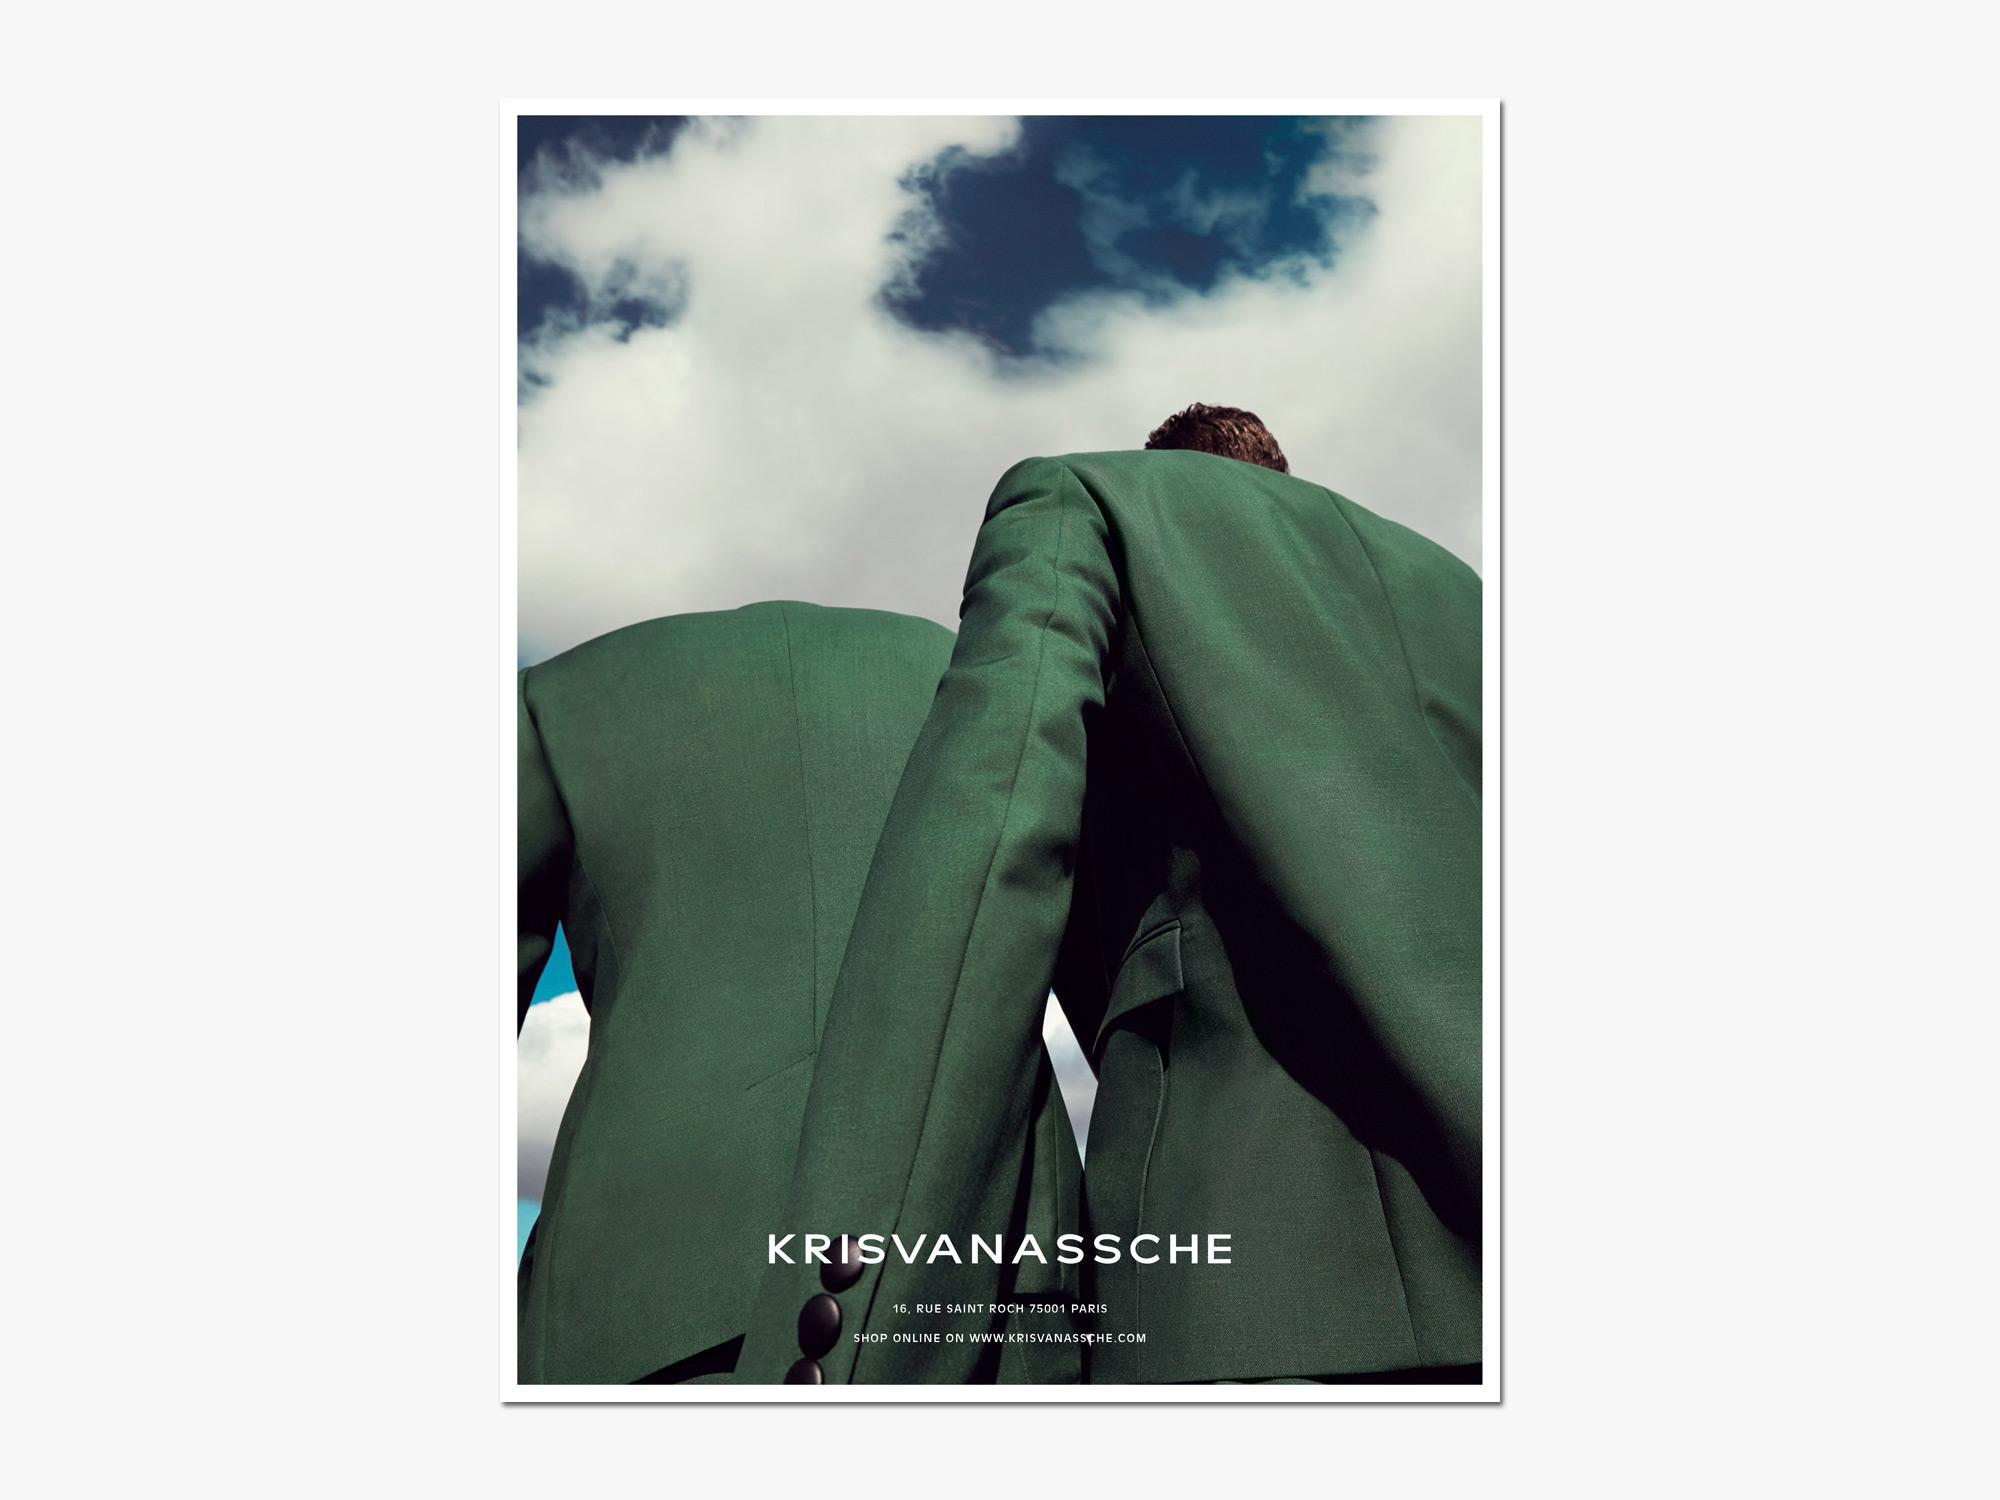 KRISVANASSCHE-SS14-Campaign-03